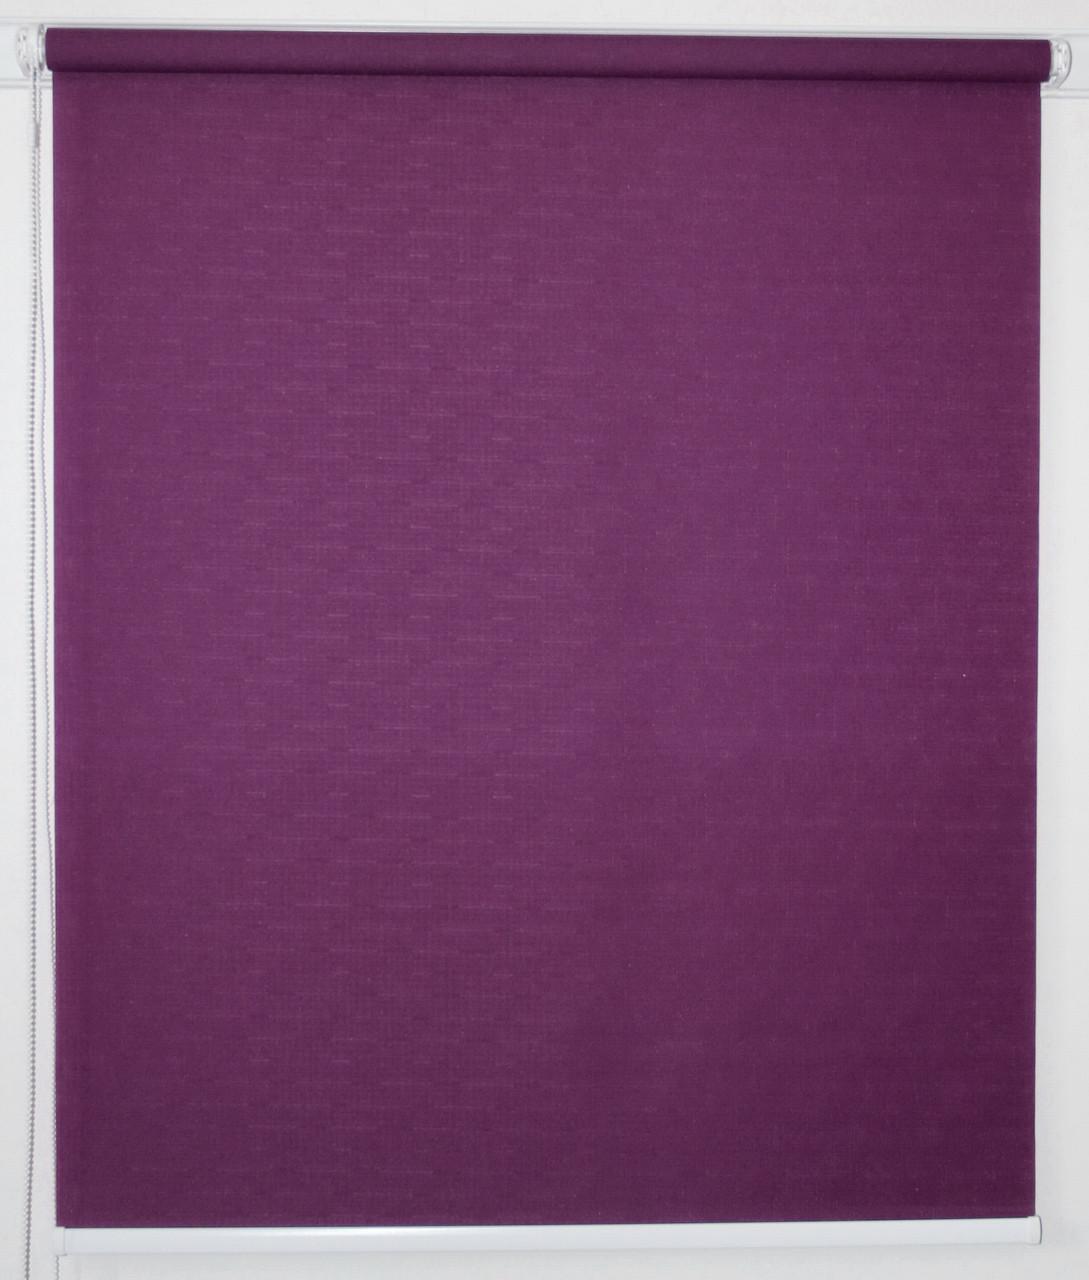 Рулонная штора 1000*1500 Лён 613 Фиолетовый